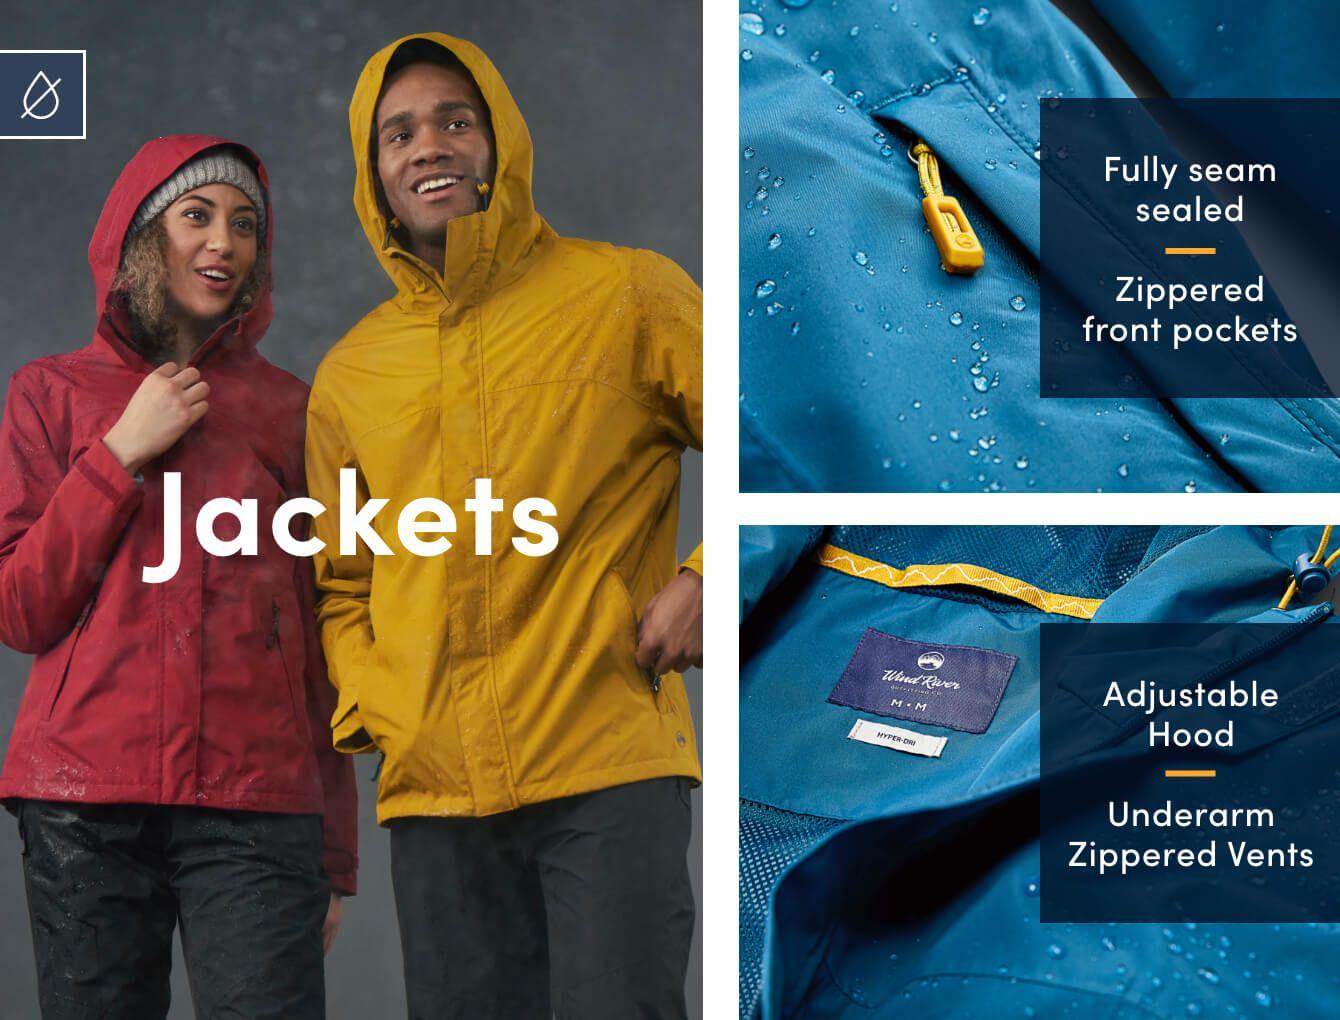 Dry Shop - Jackets